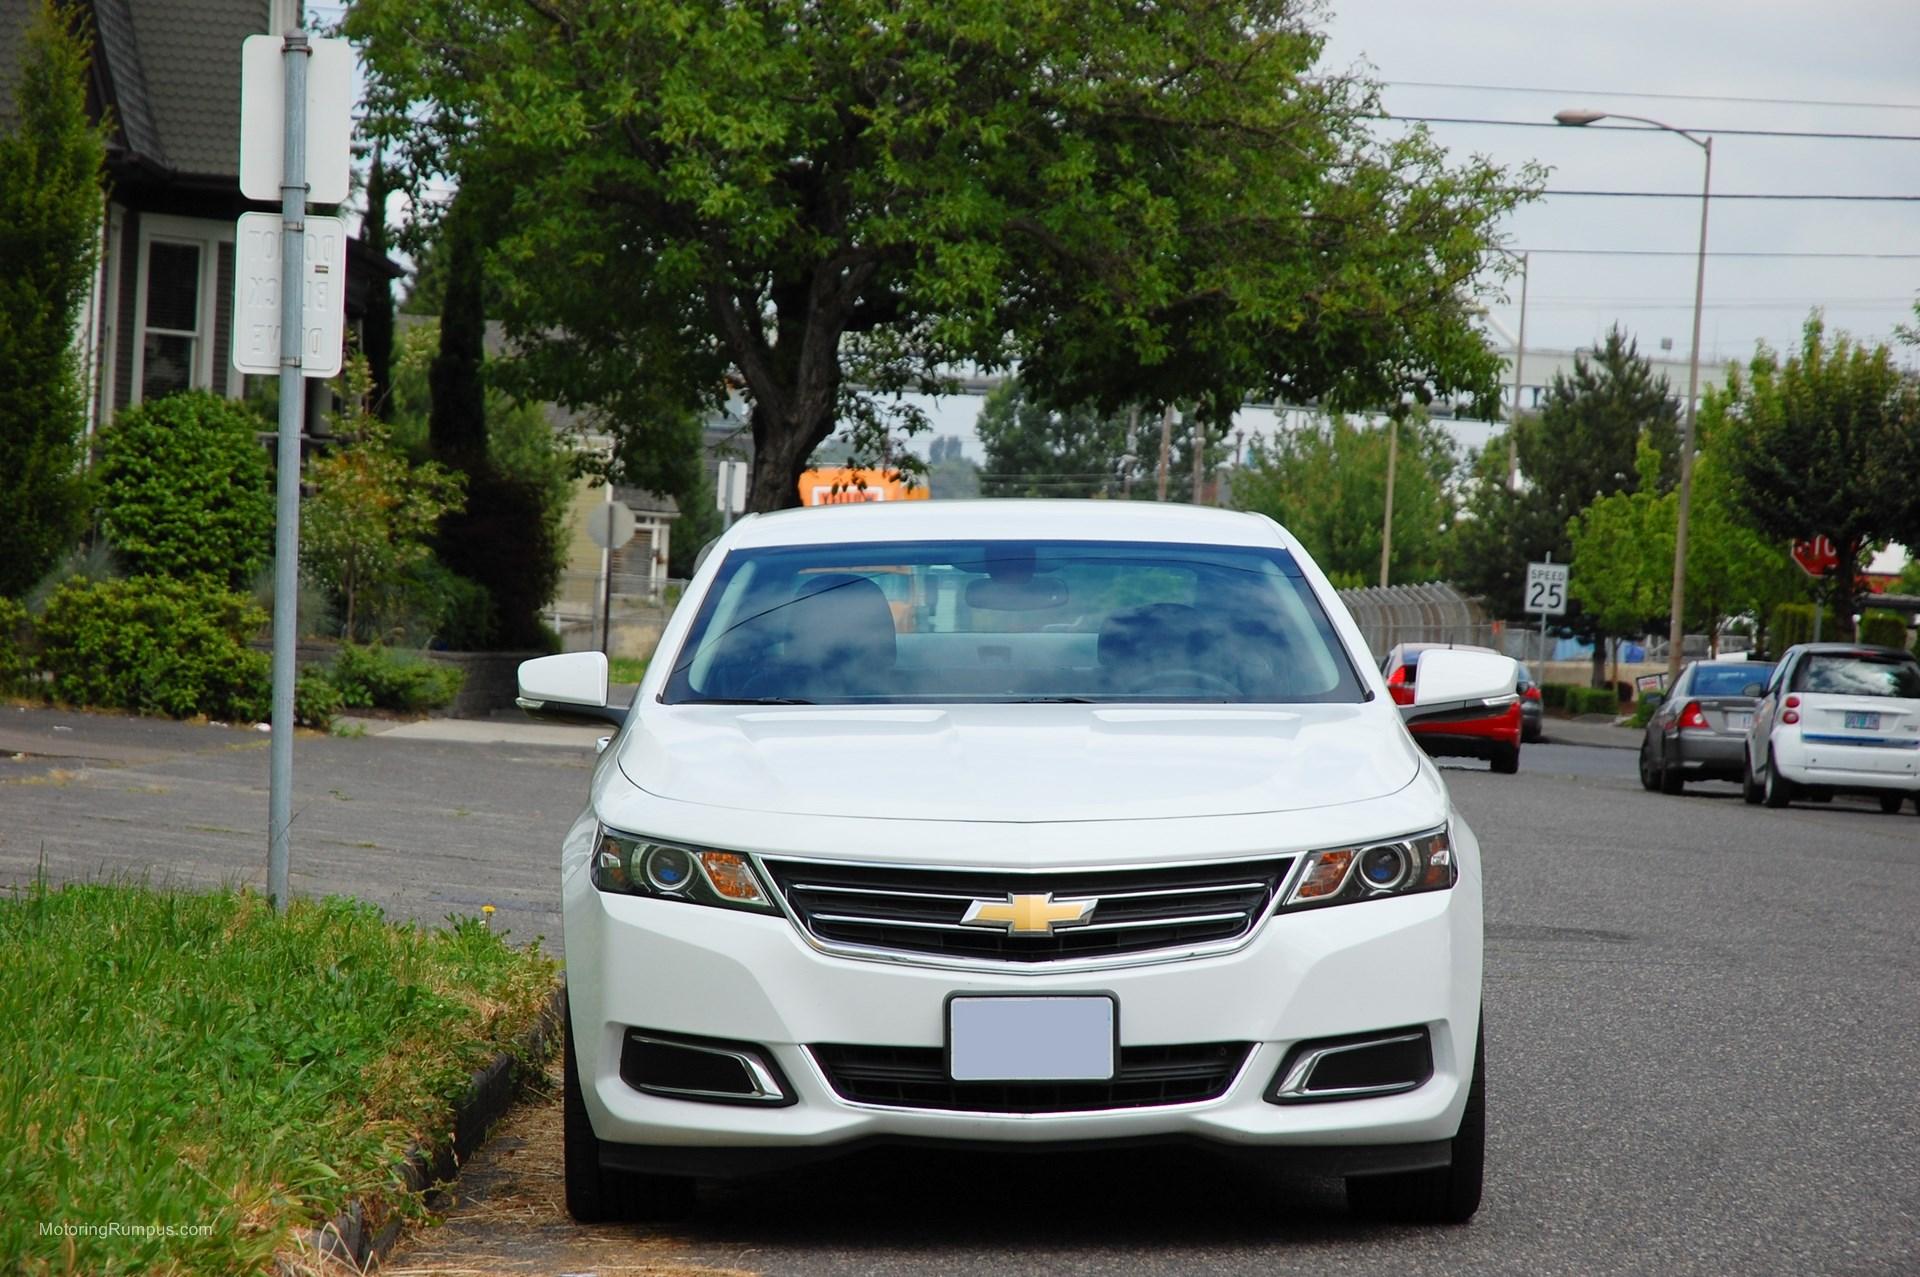 2014 Chevy Impala Front